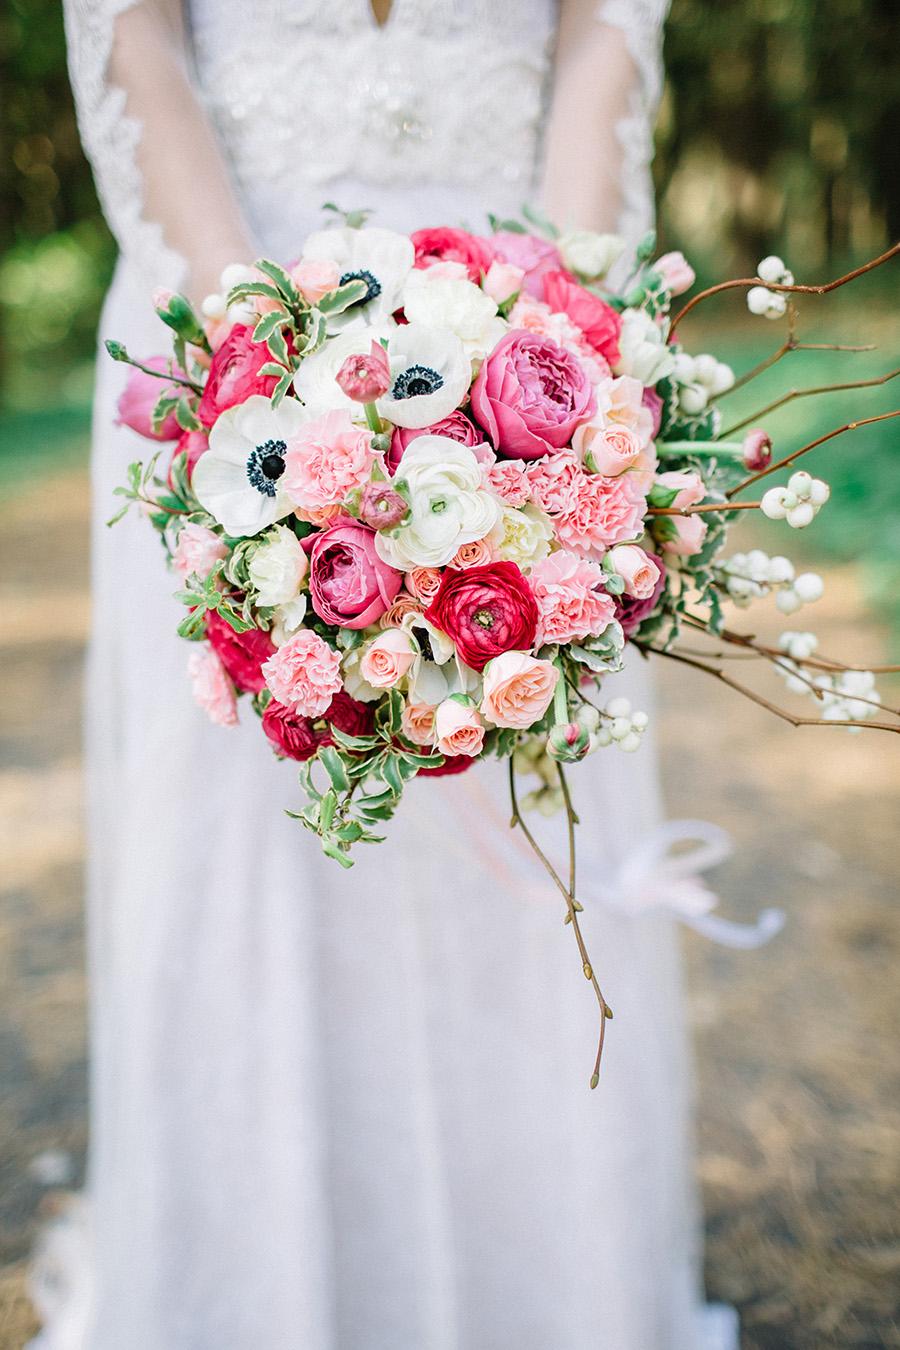 Summer Wedding Bouquet - large bright pink bouquet